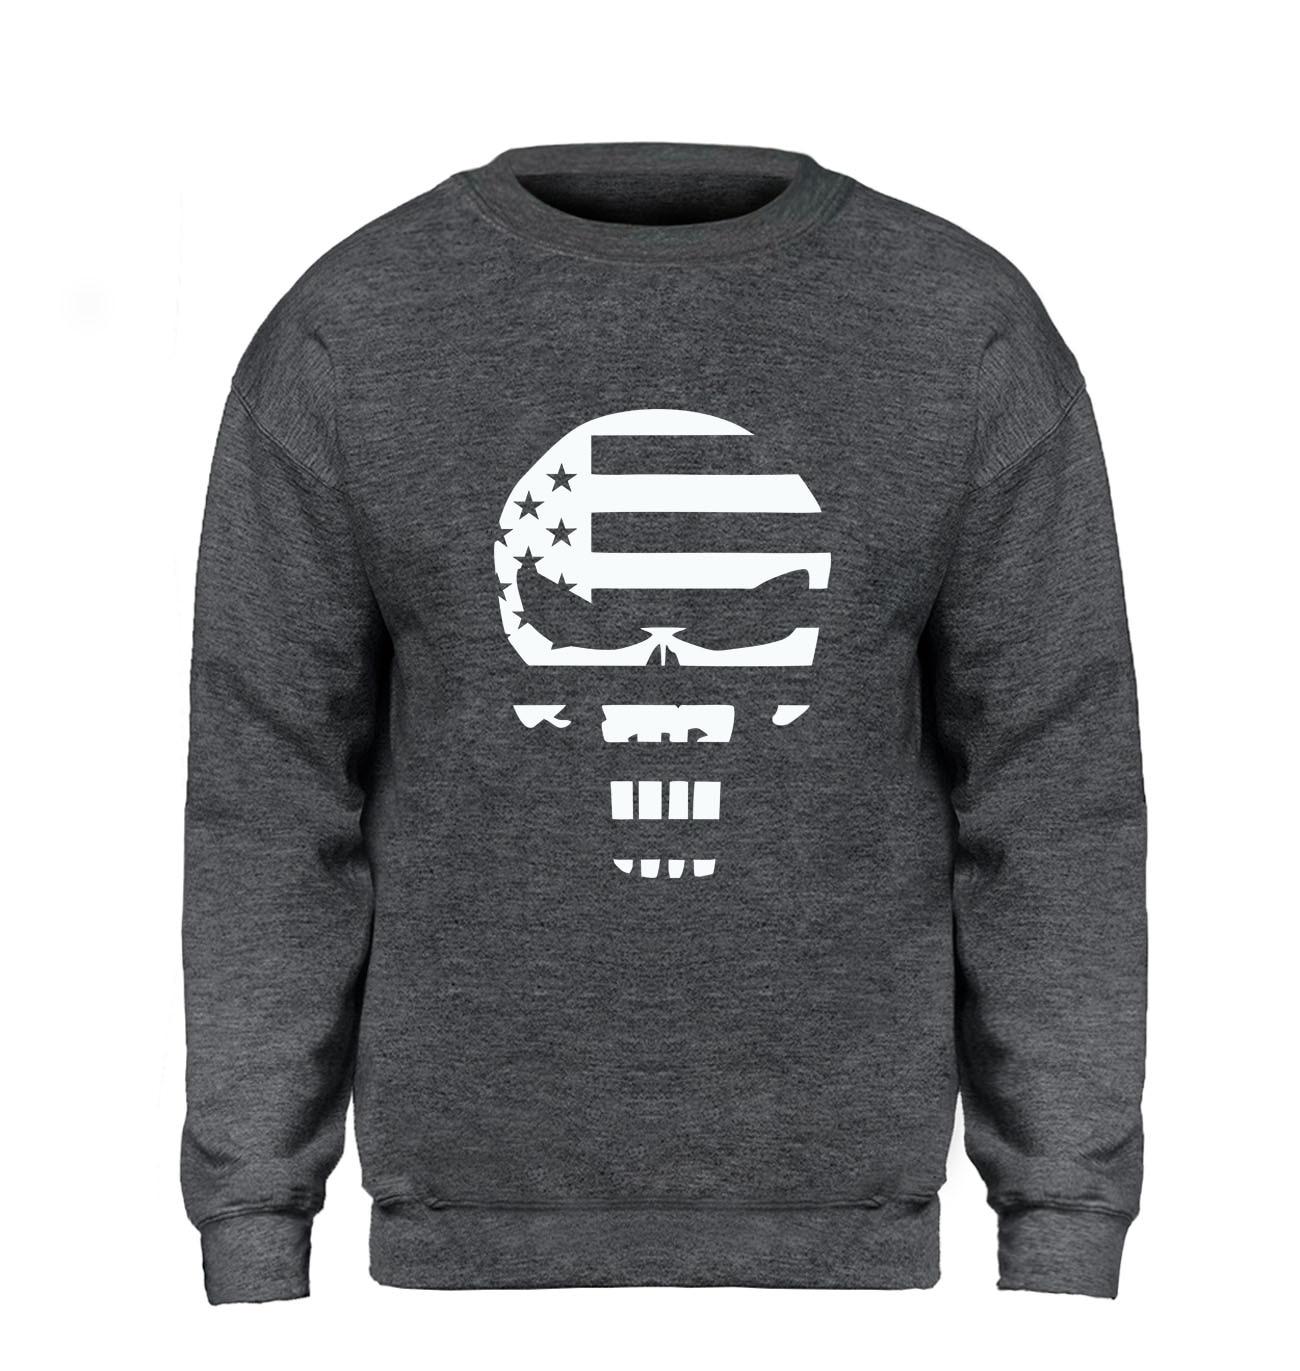 American Sniper Punisher Skull Navy Seal Hoodie Men Hip Hop Sweatshirt Winter Autumn Fleece Warm Swag Sportswear Brand Clothing